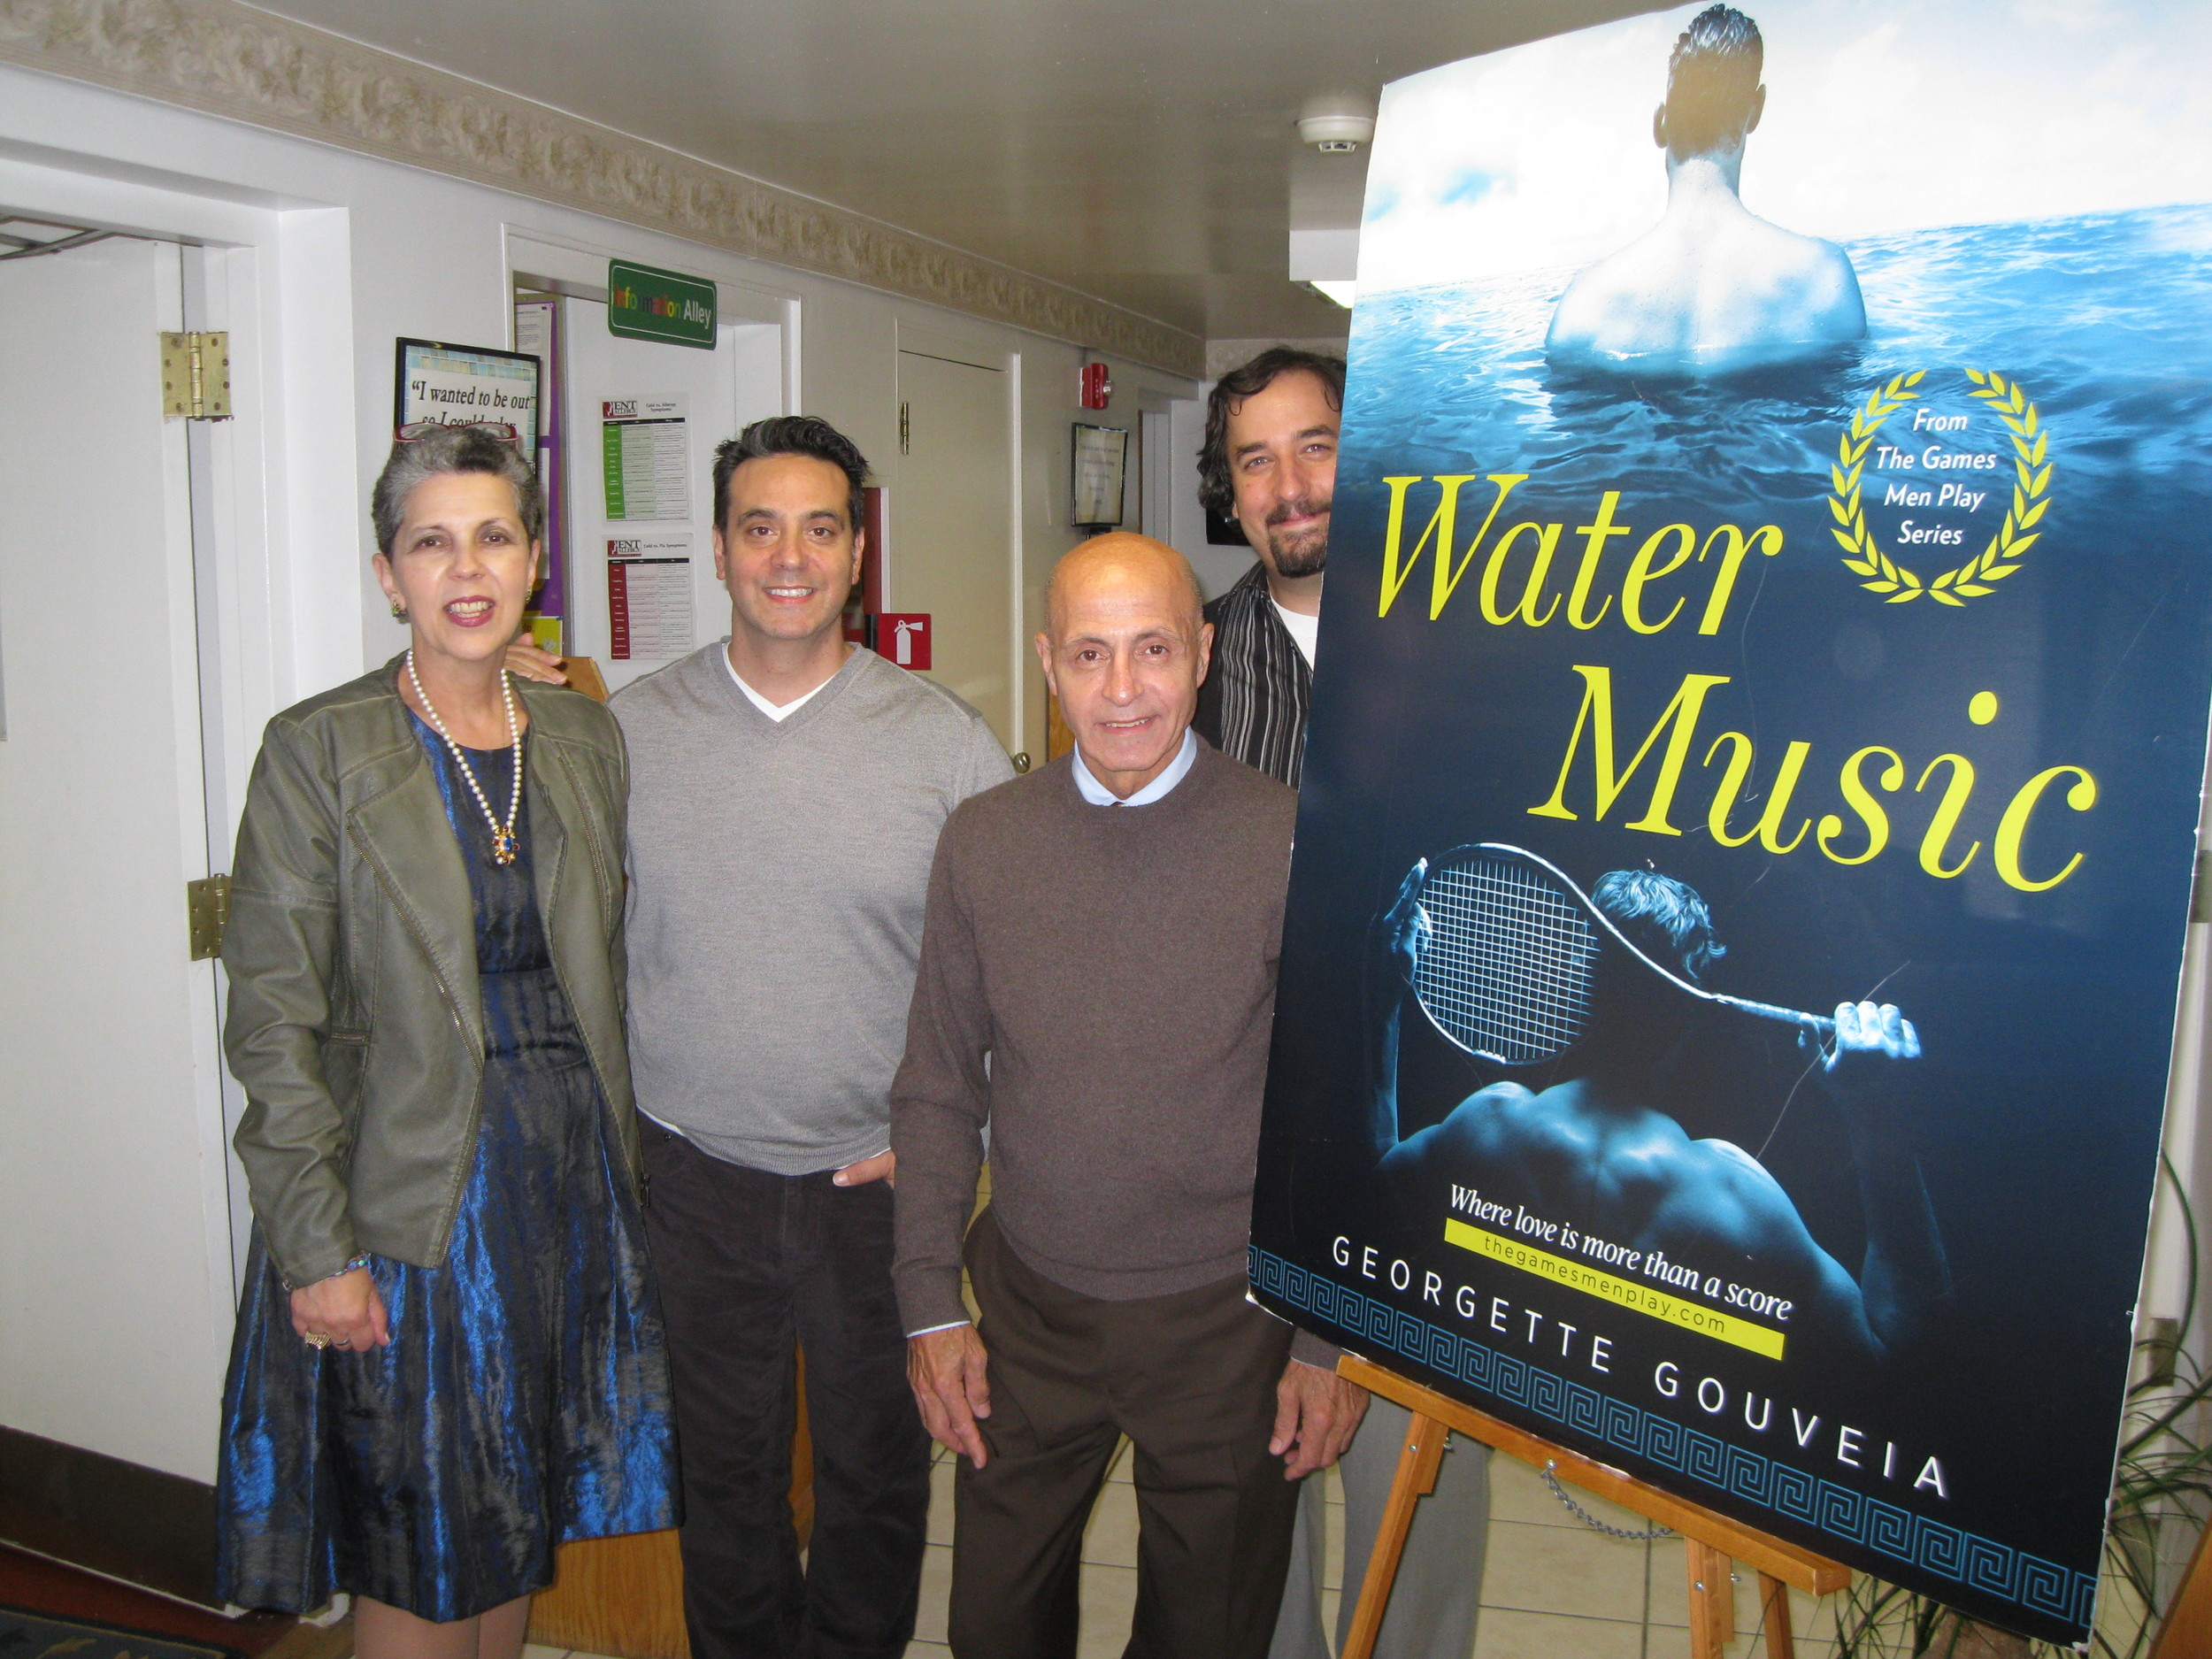 With Darren Scala, Nick Zullo, and Scott S. Havelka, The Loft's interim executive director